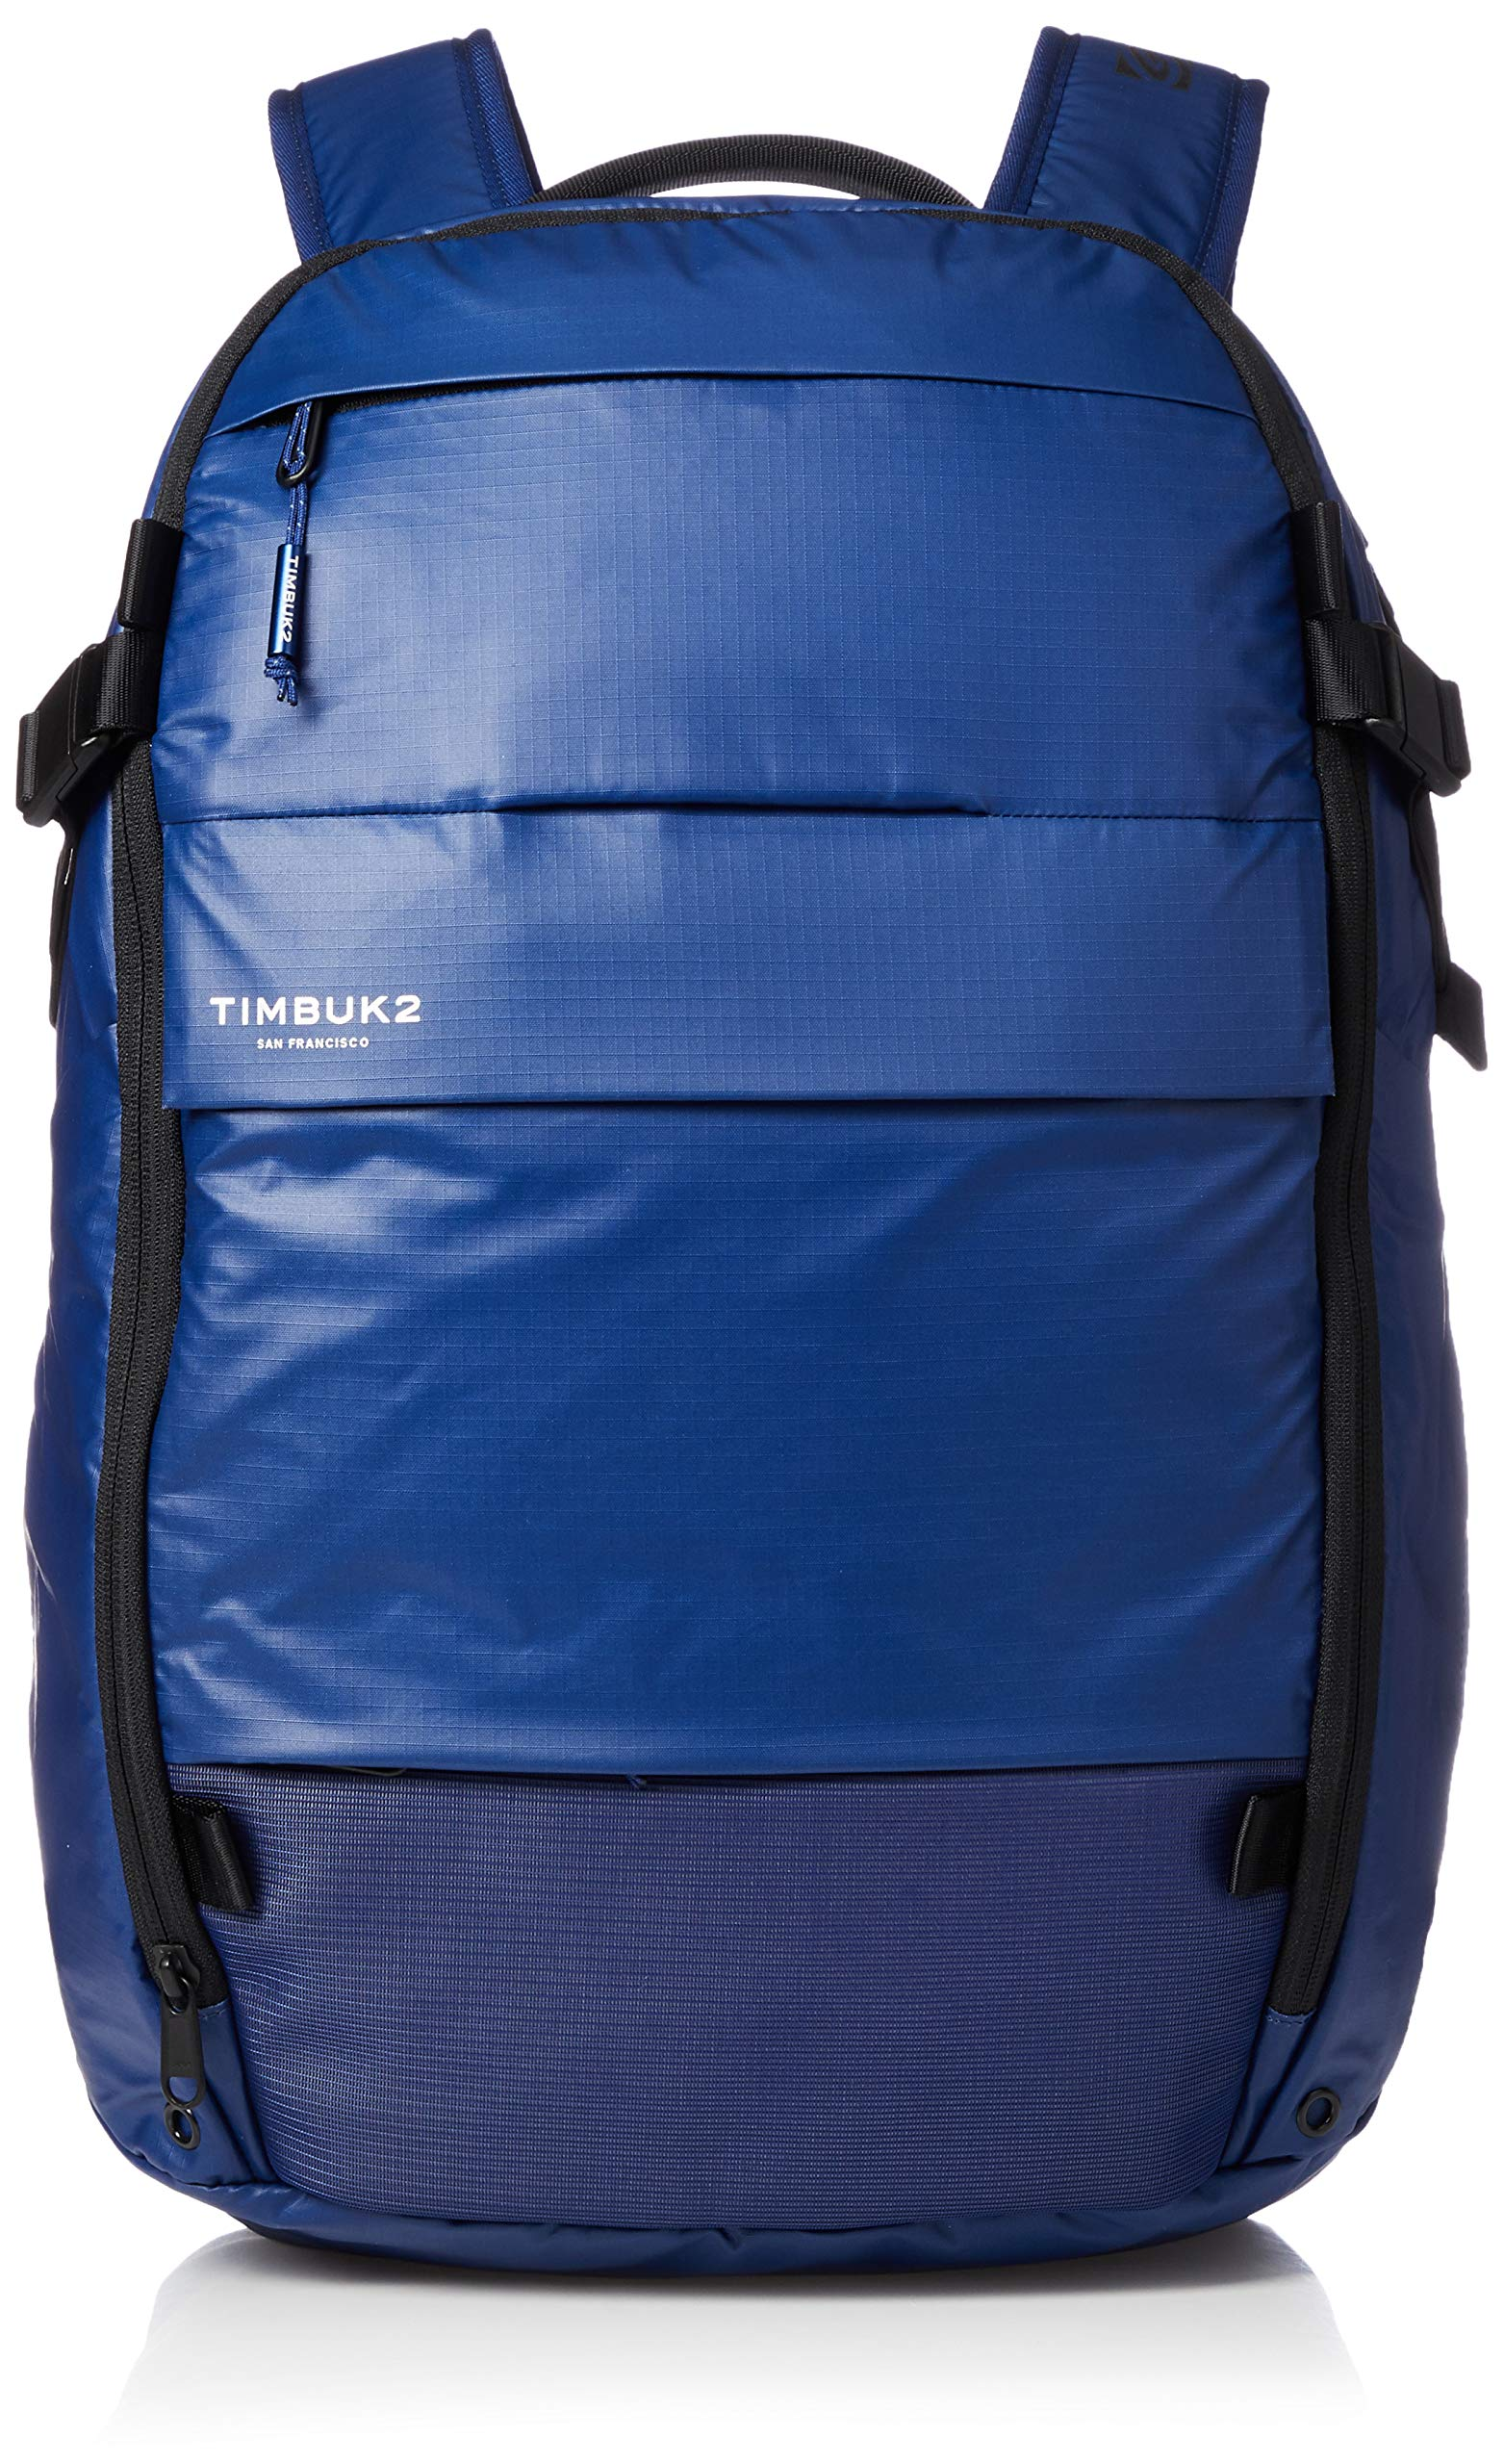 Timbuk2 Parker Pack Lightweight, Blue Wish, OS by Timbuk2